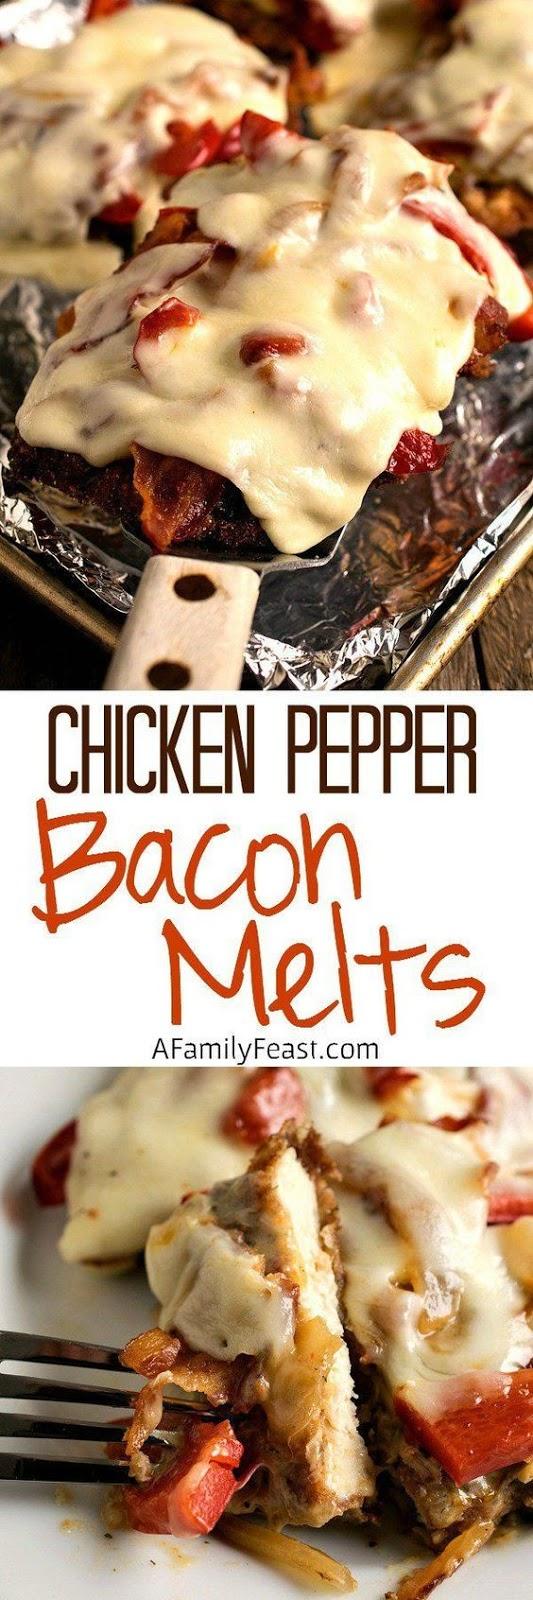 Chicken Pepper Bacon Melts